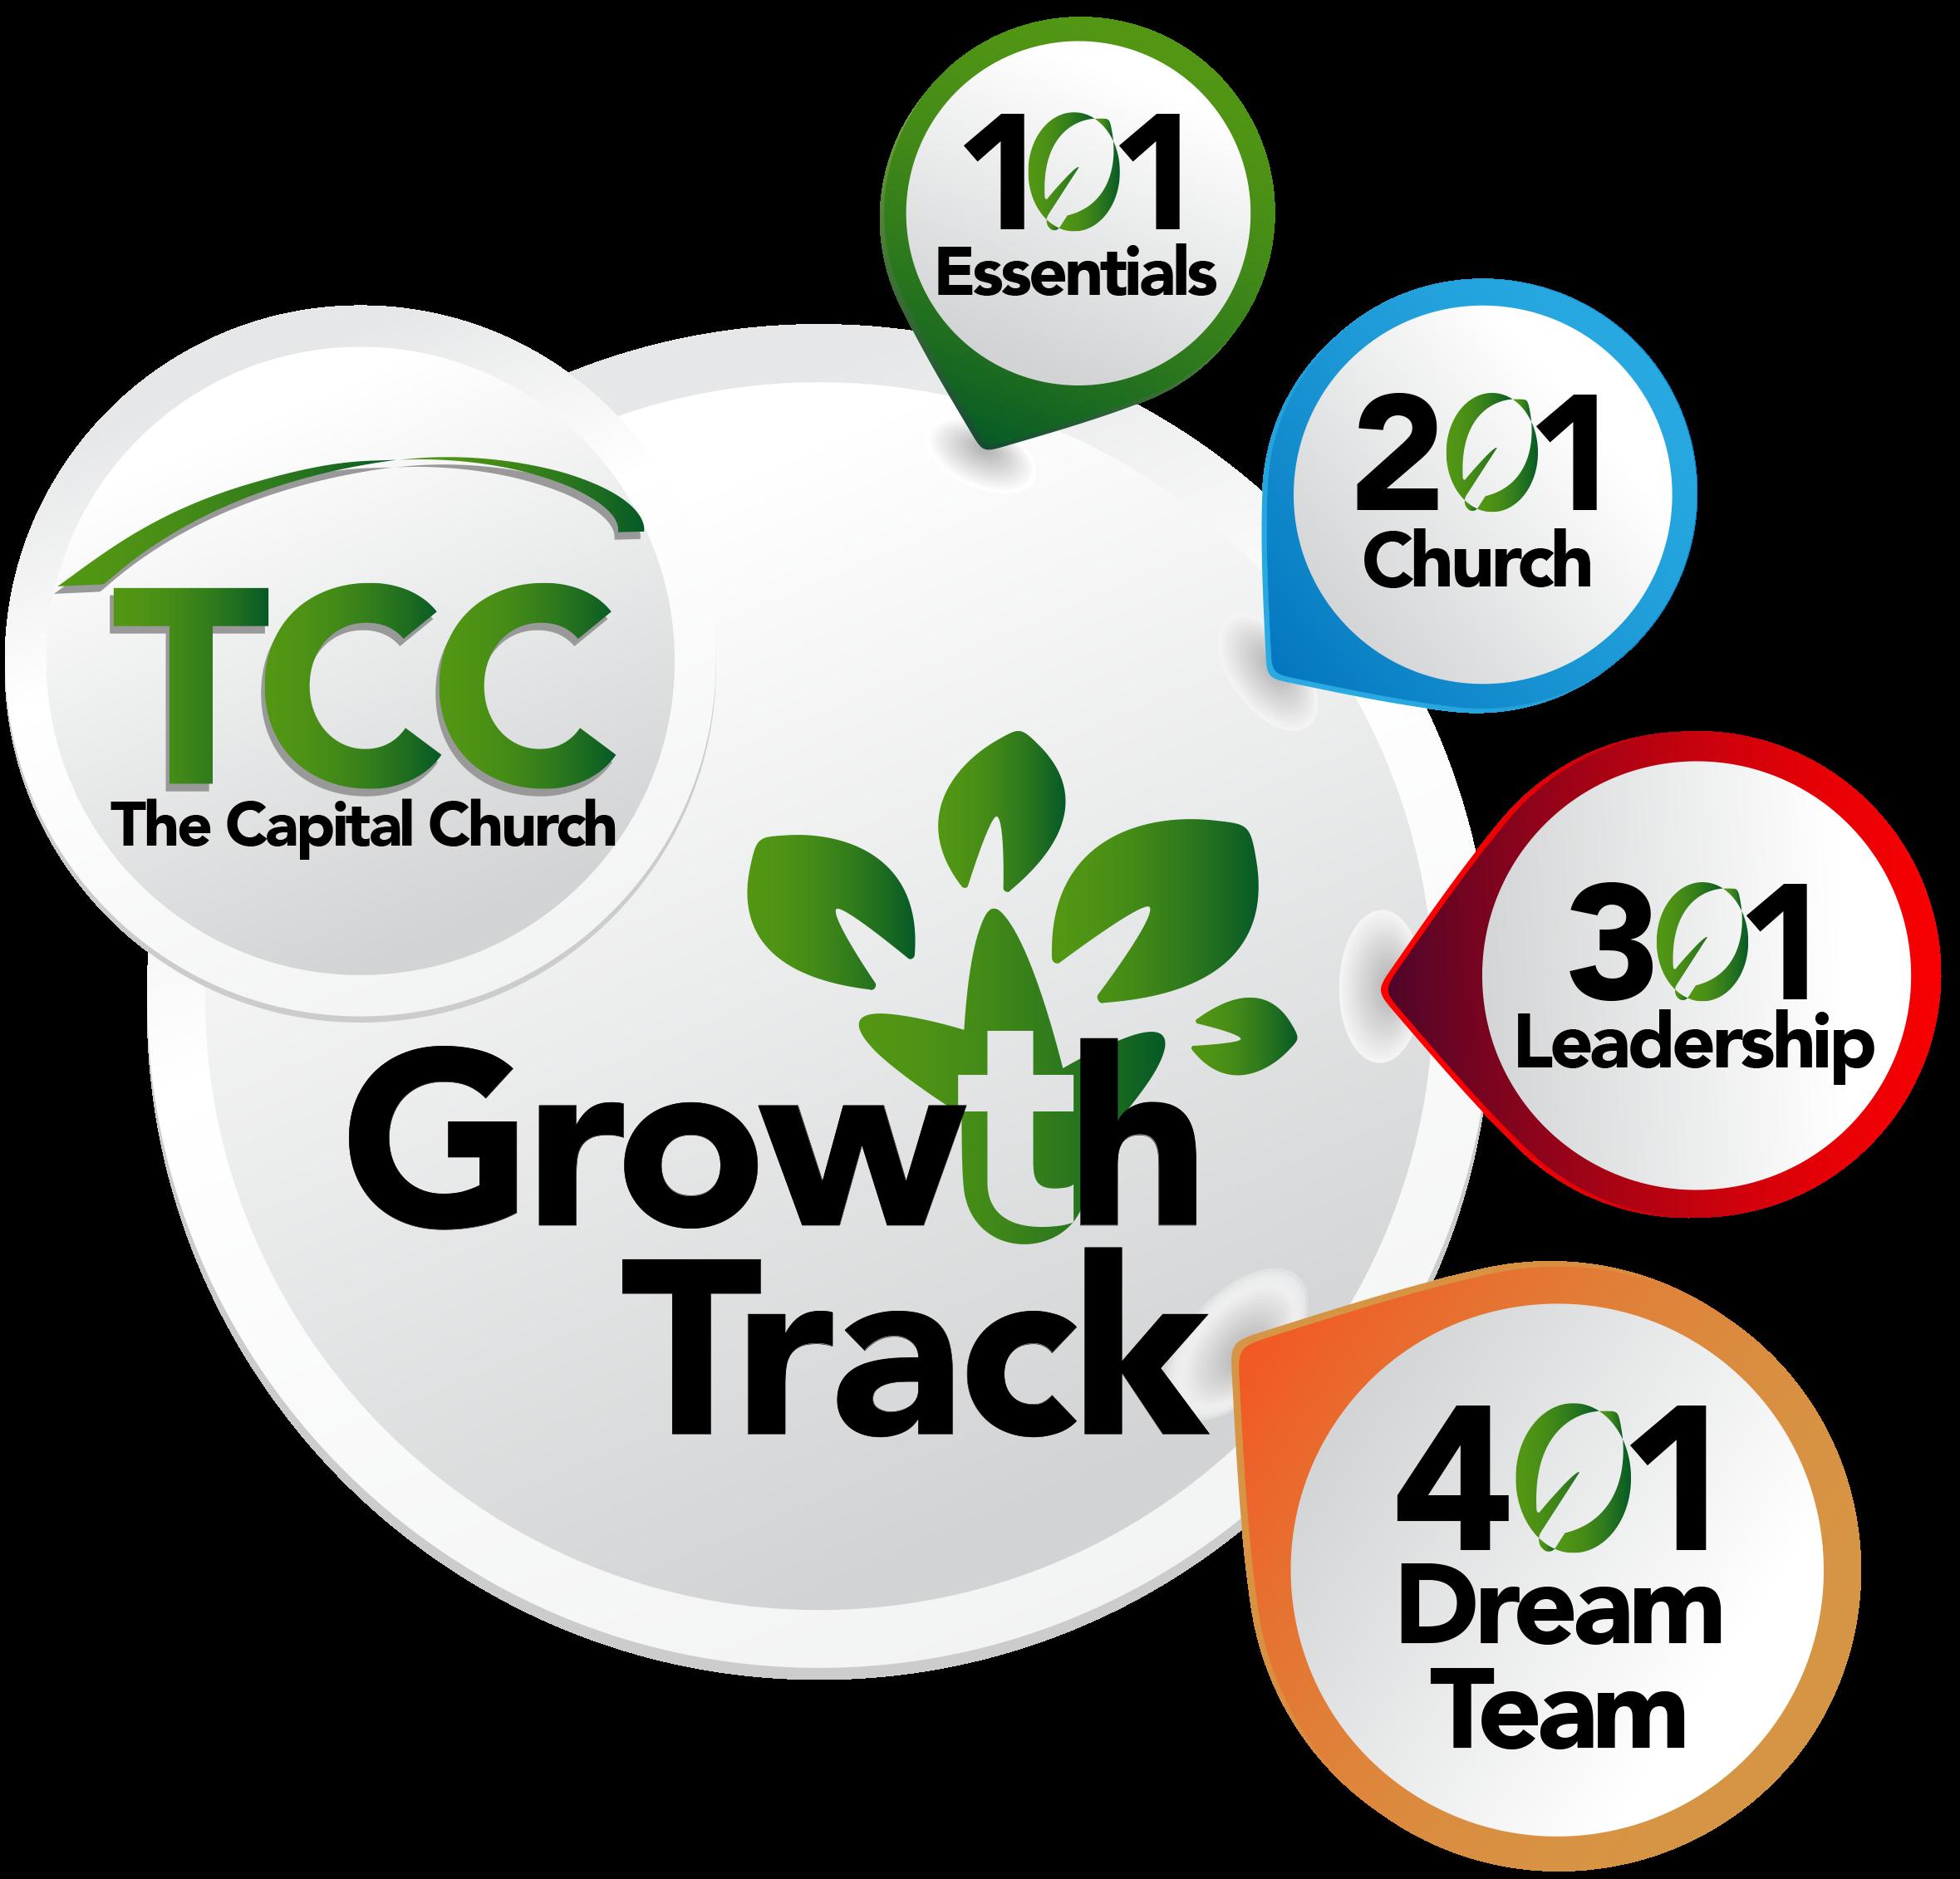 TCC Growth Track